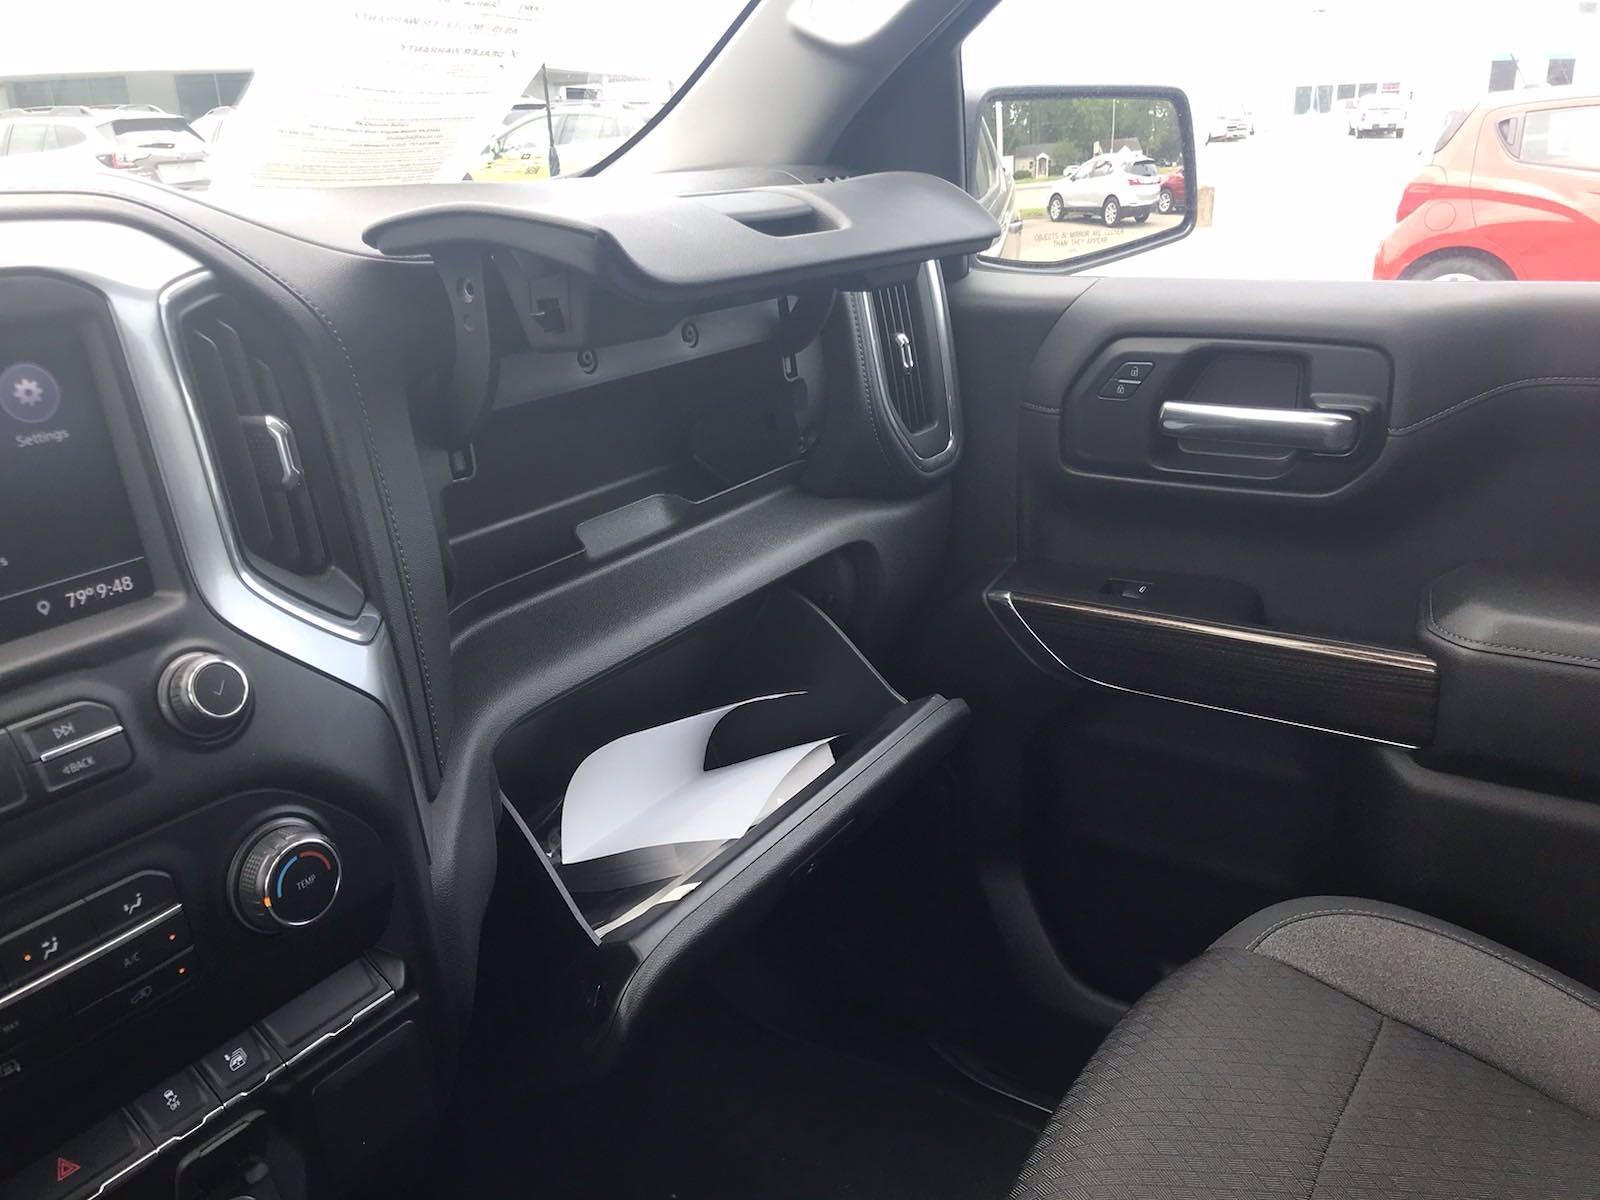 2020 Chevrolet Silverado 1500 Crew Cab 4x4, Pickup #16476PN - photo 37